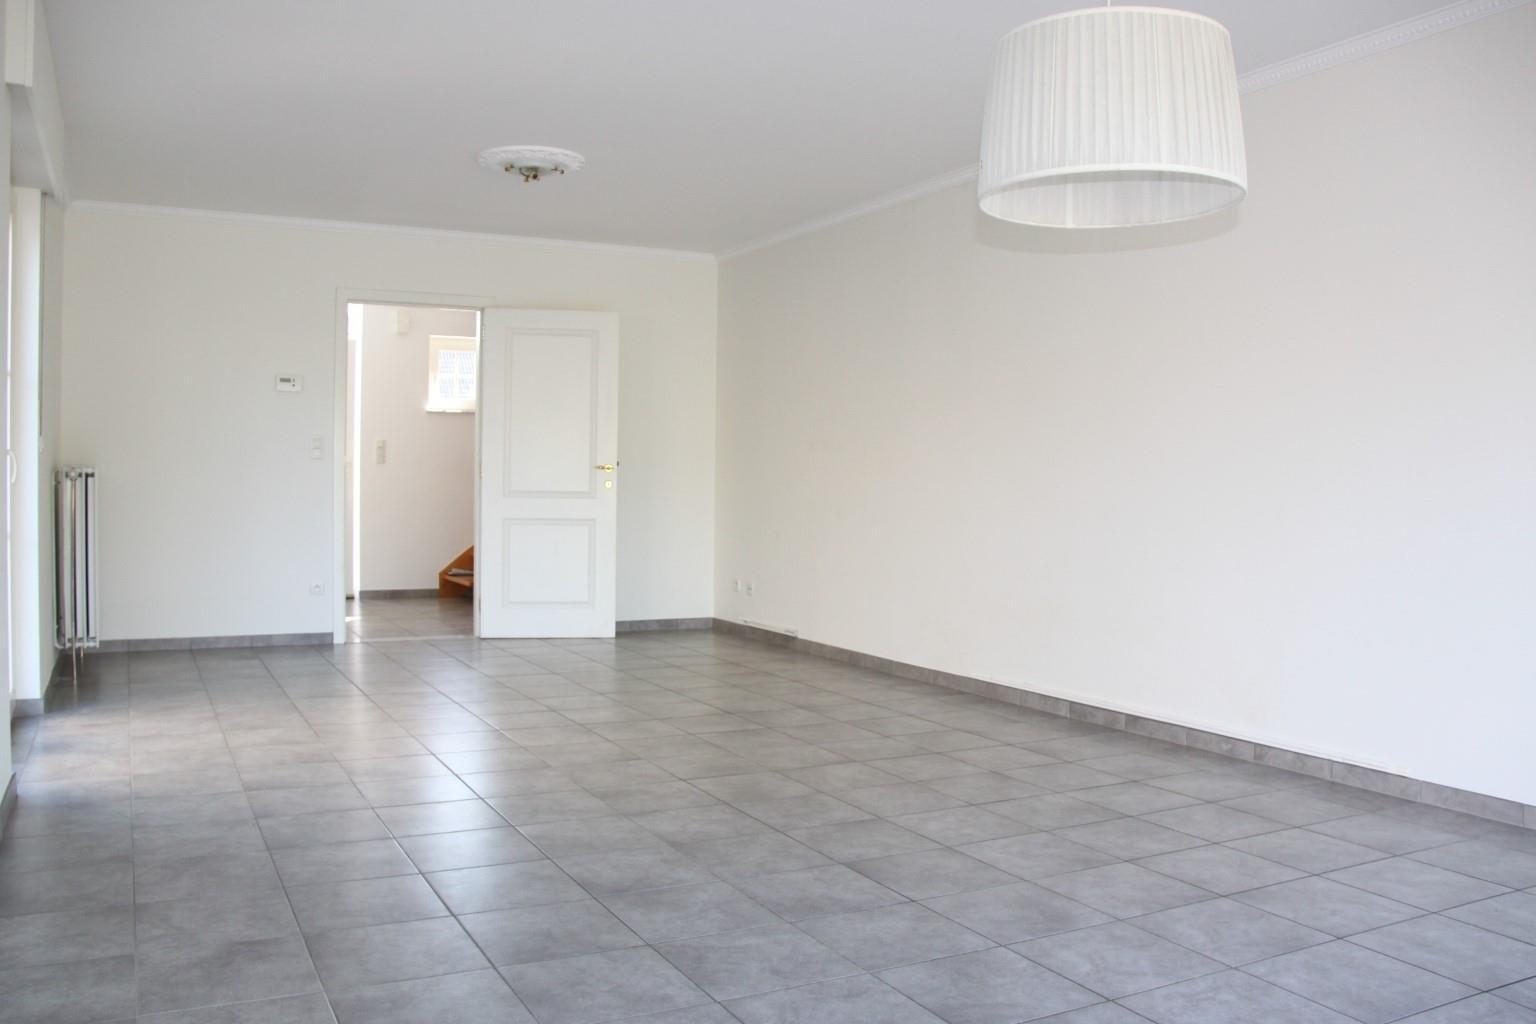 A997W5202103121203/a183107399934bb6add4a6c19e6b0763/livingroom.jpg